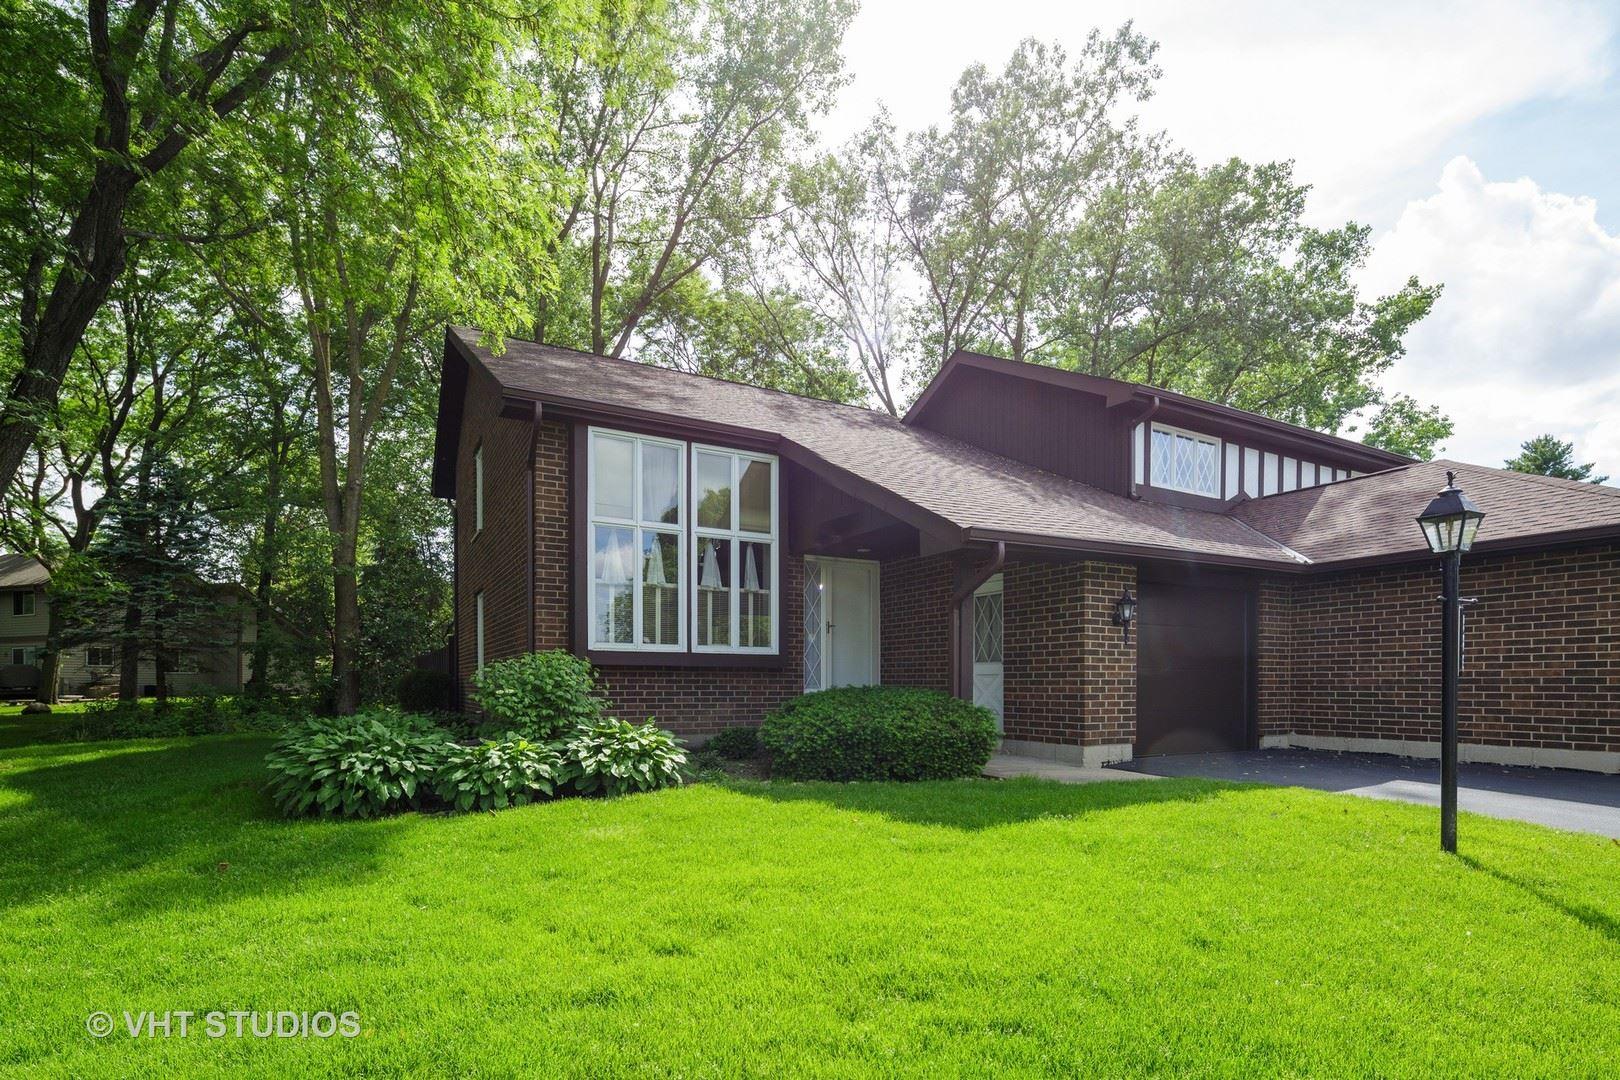 583 Saint Andrews Court, Crystal Lake, IL 60014 - #: 10739202